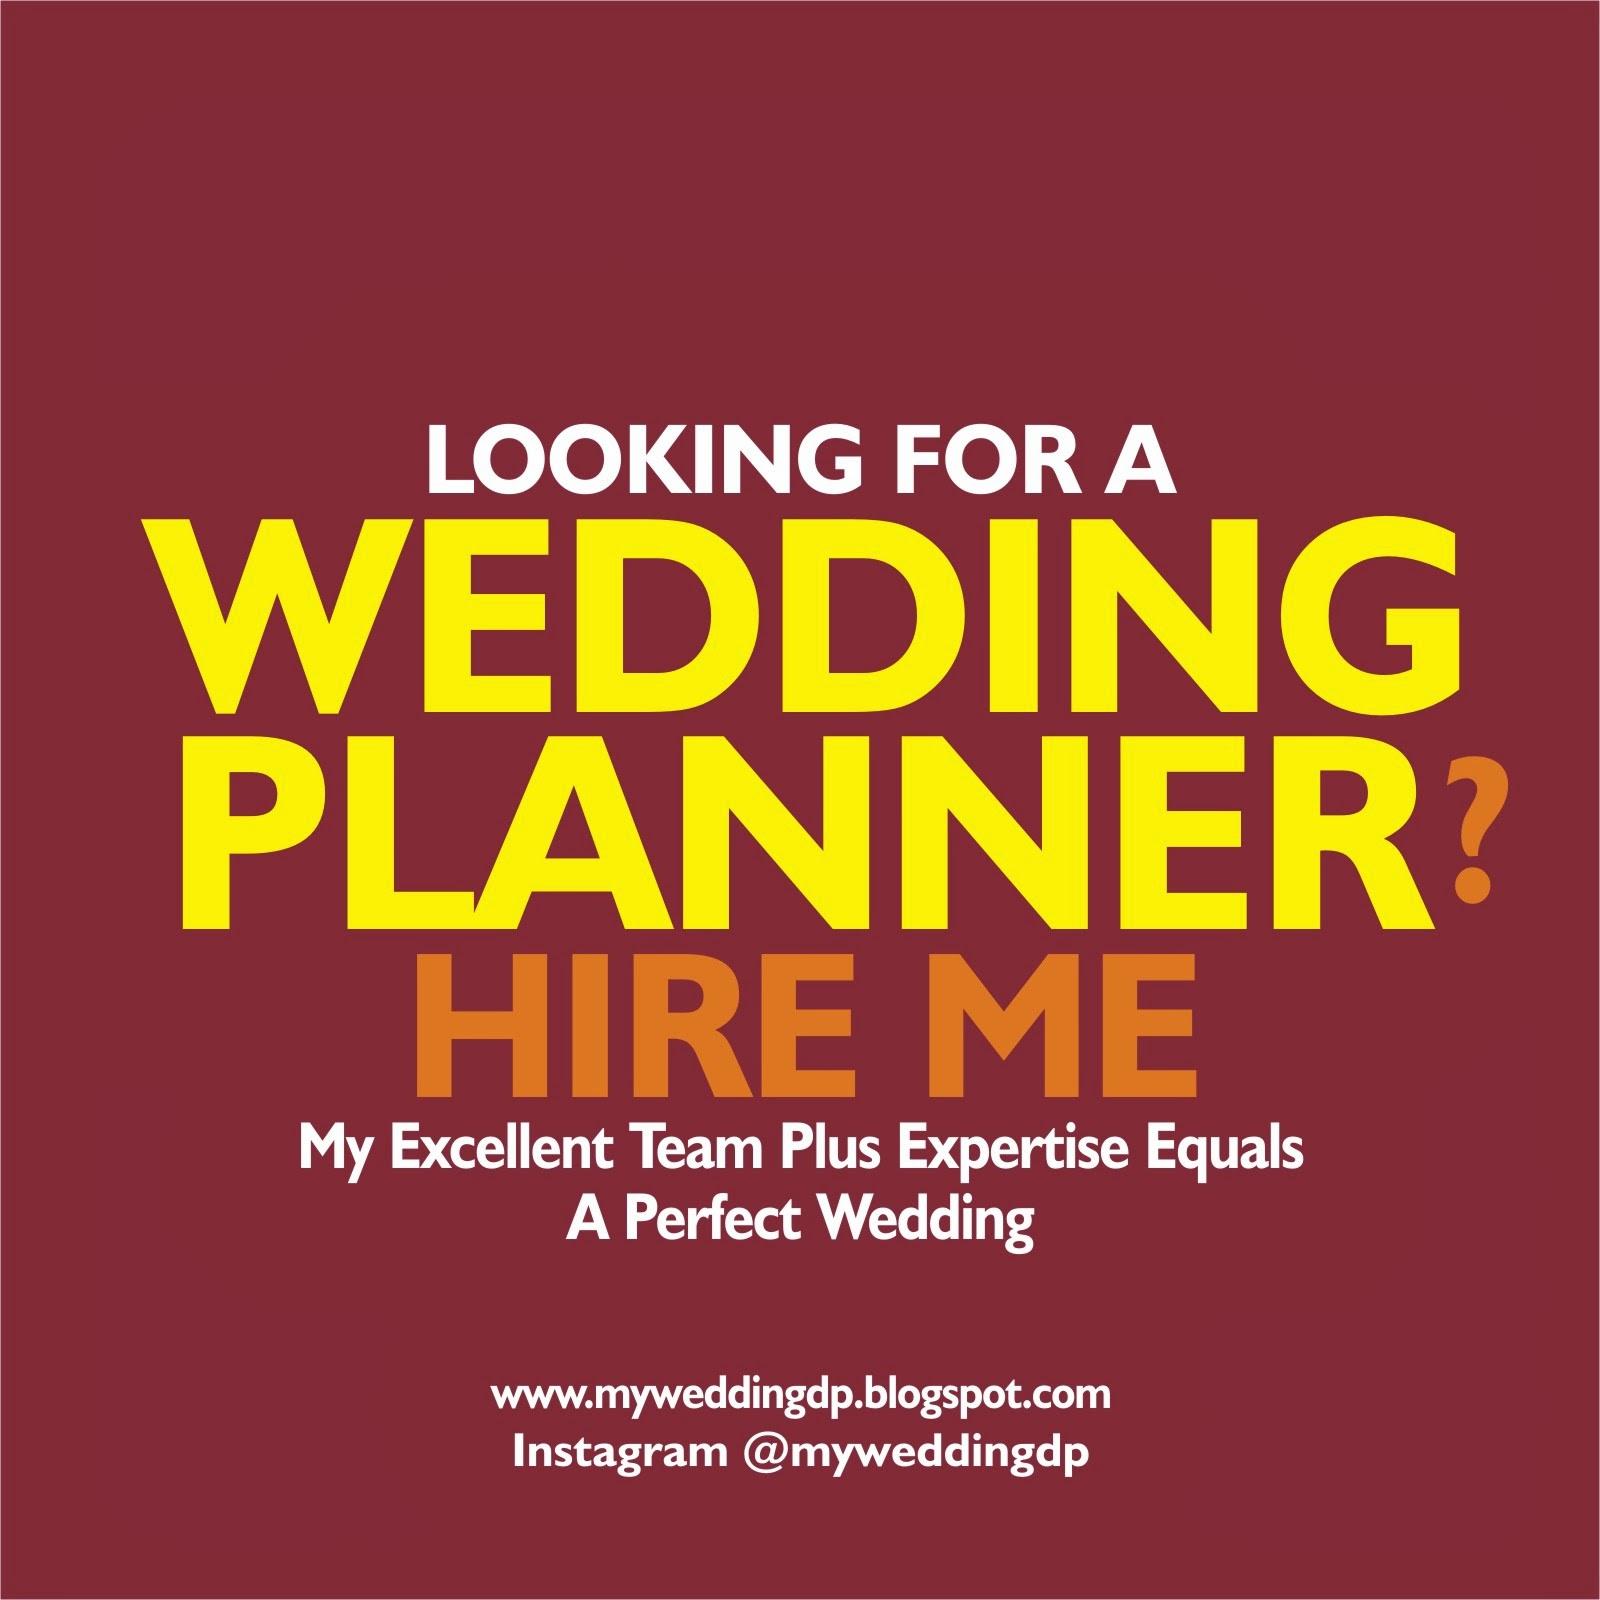 MAKE ME YOUR WEDDING PLANNER